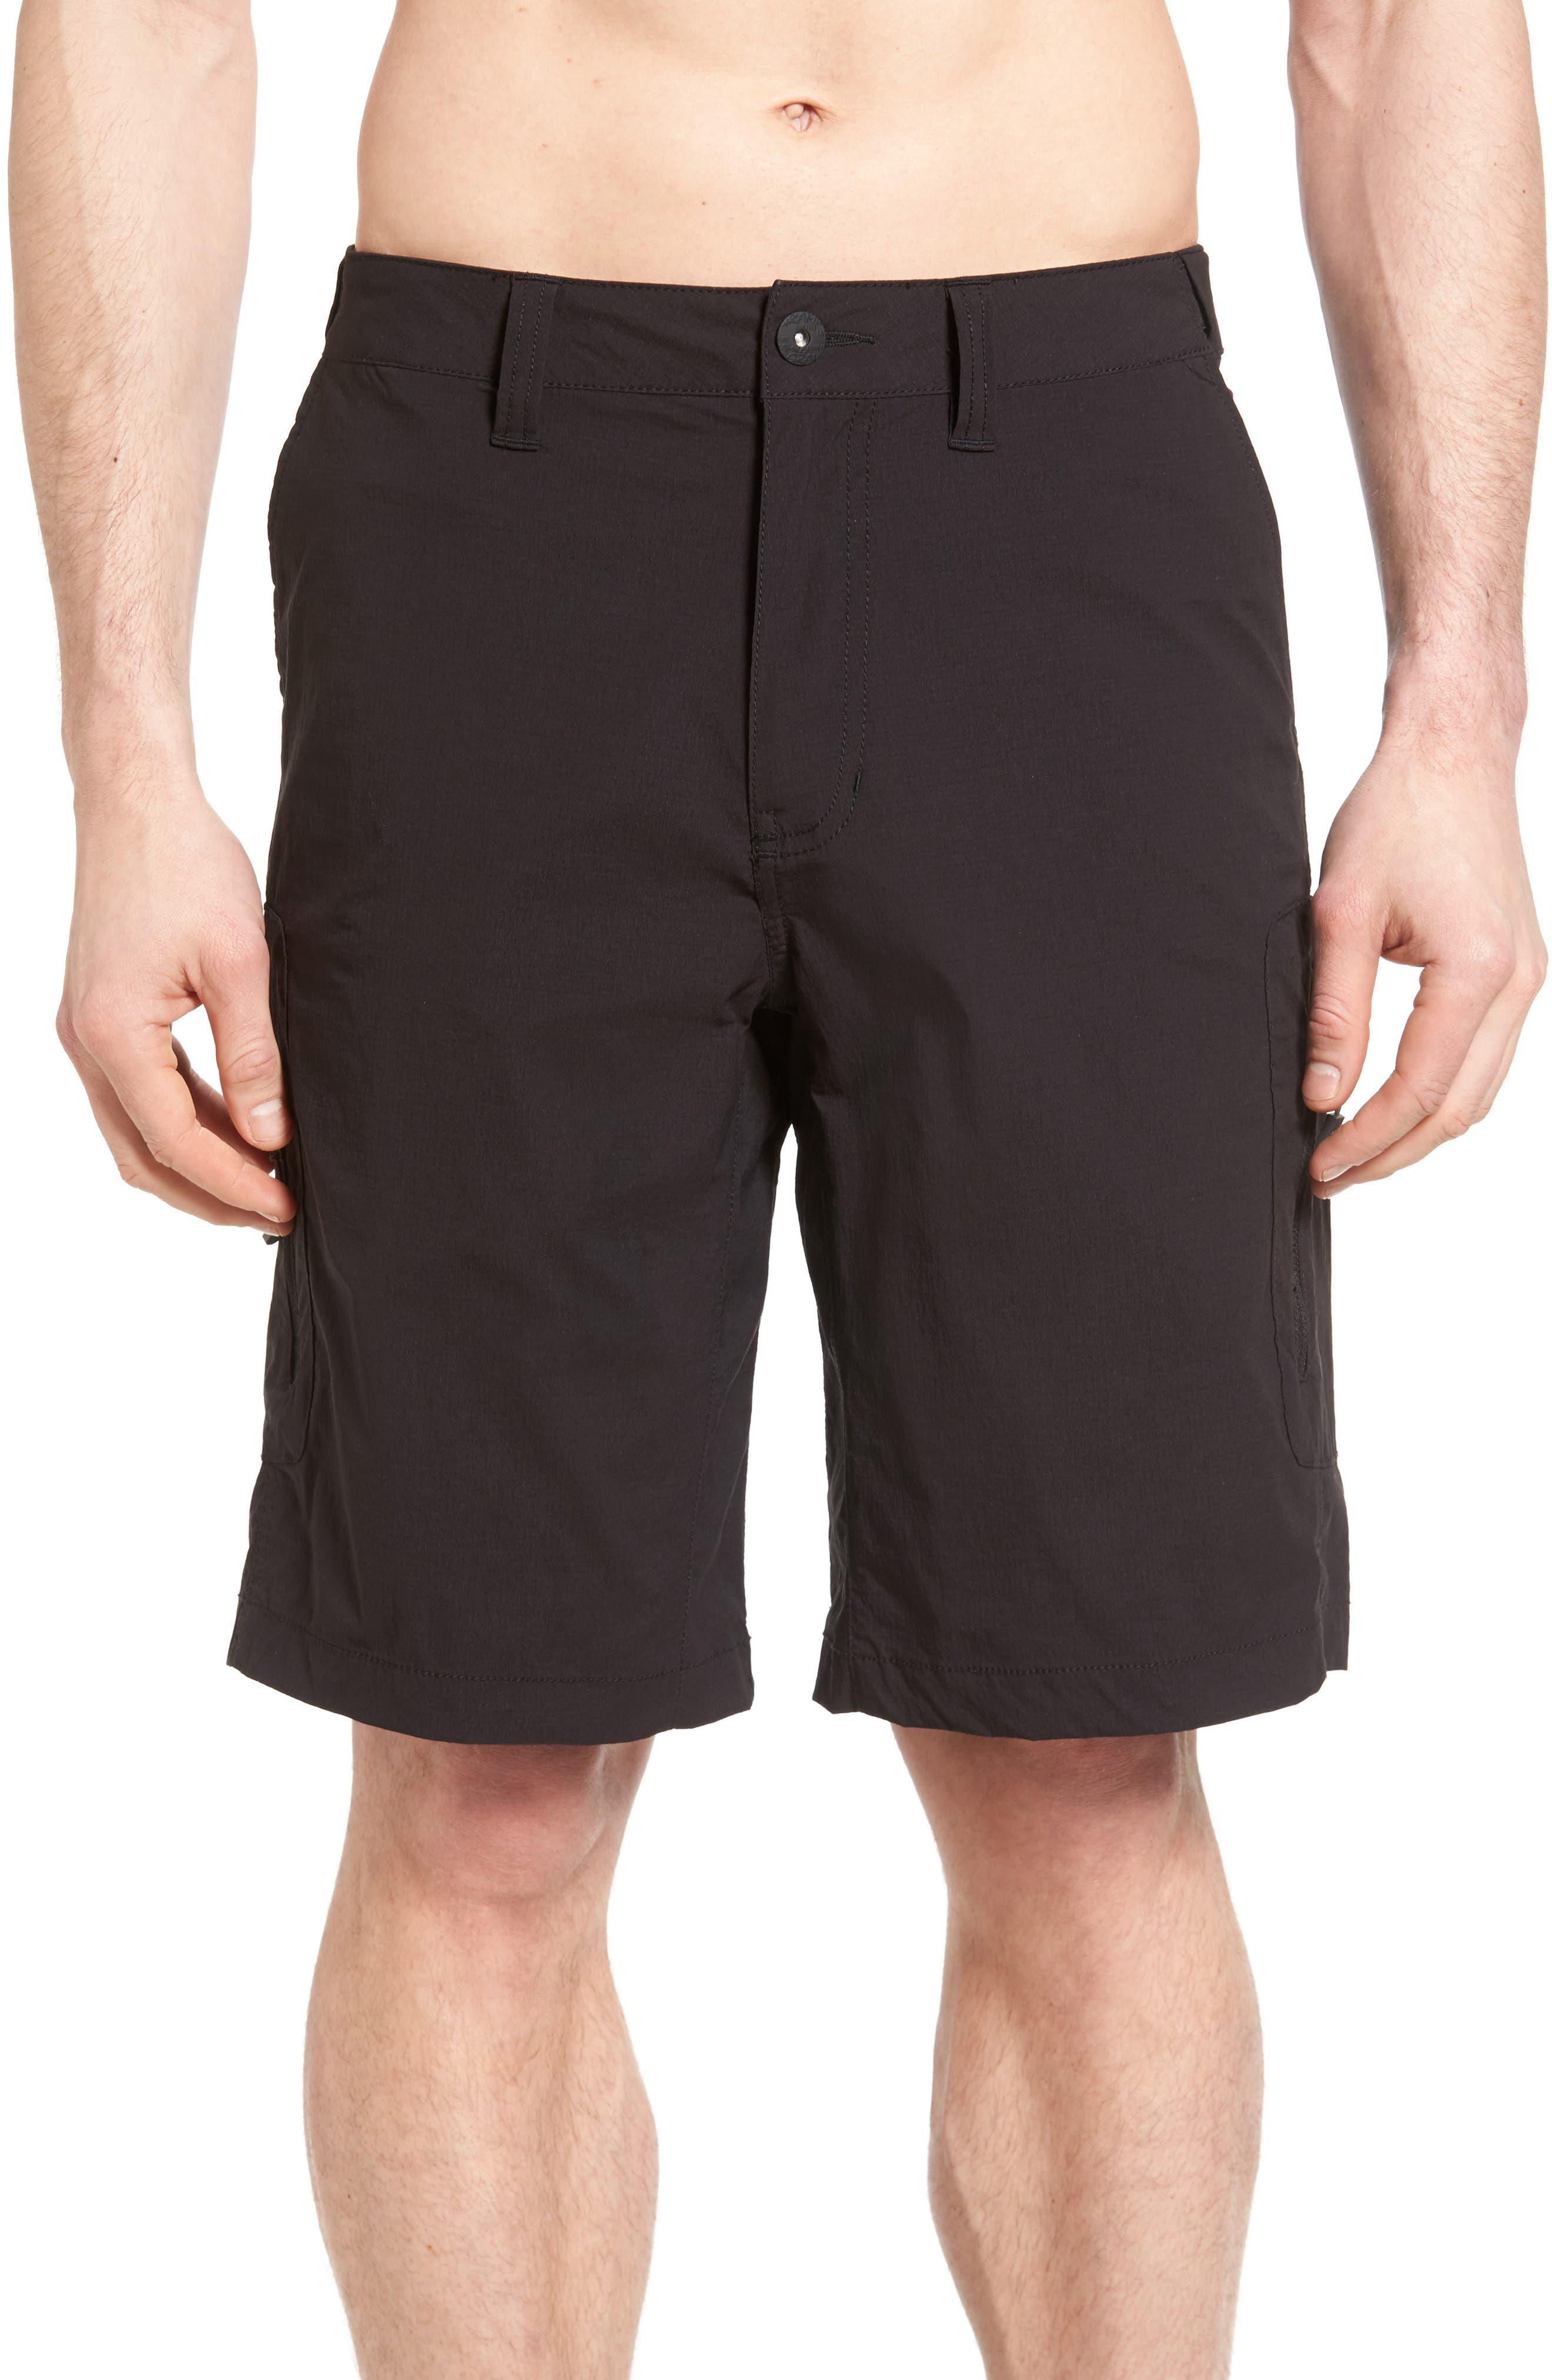 Rough & Tumble Hiking Shorts,                         Main,                         color, 002